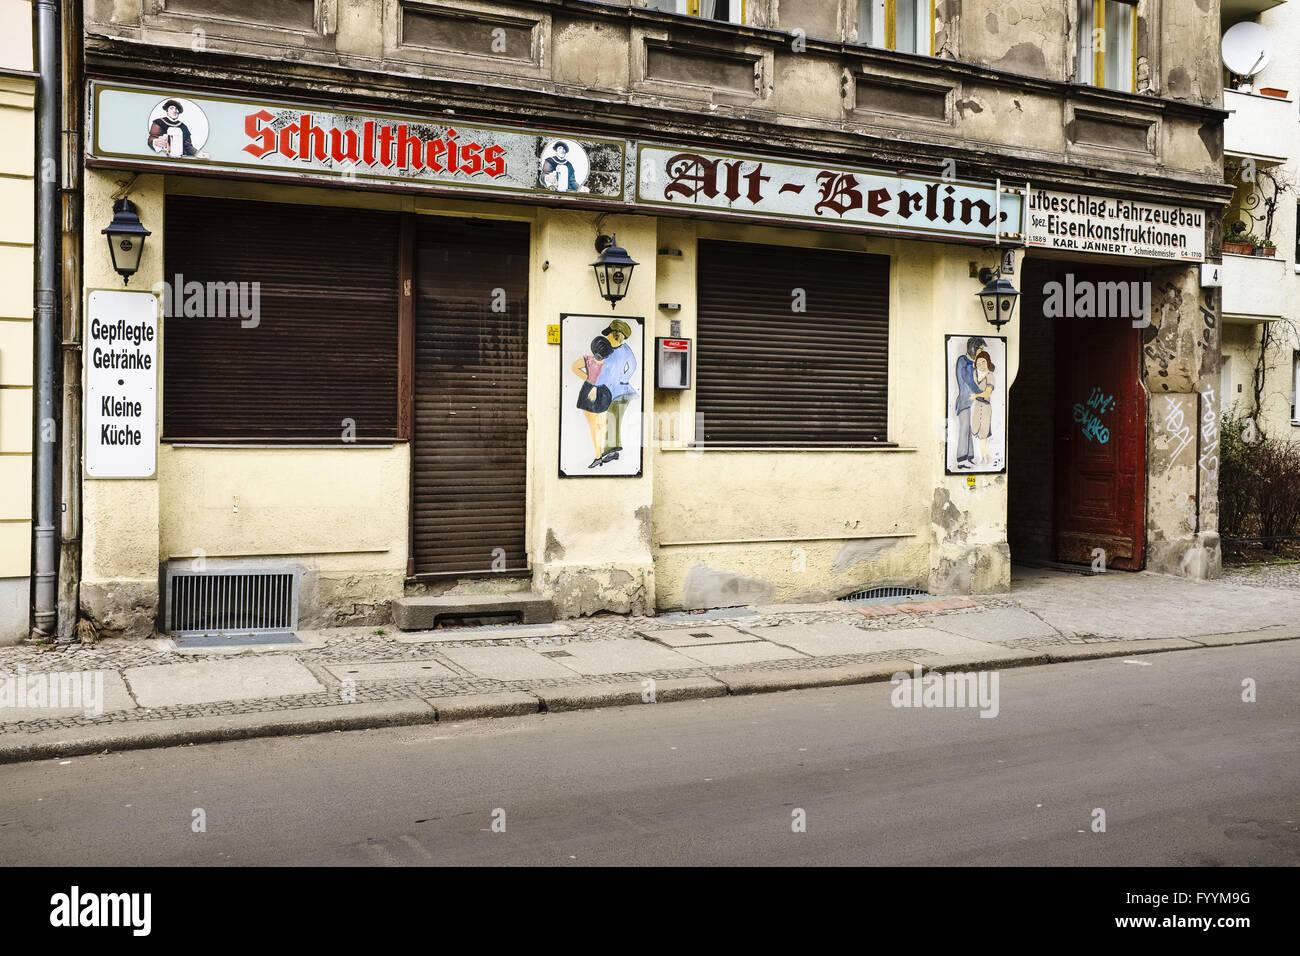 Berlin Germany Old Berlin Pub Stock Photos & Berlin Germany Old ...